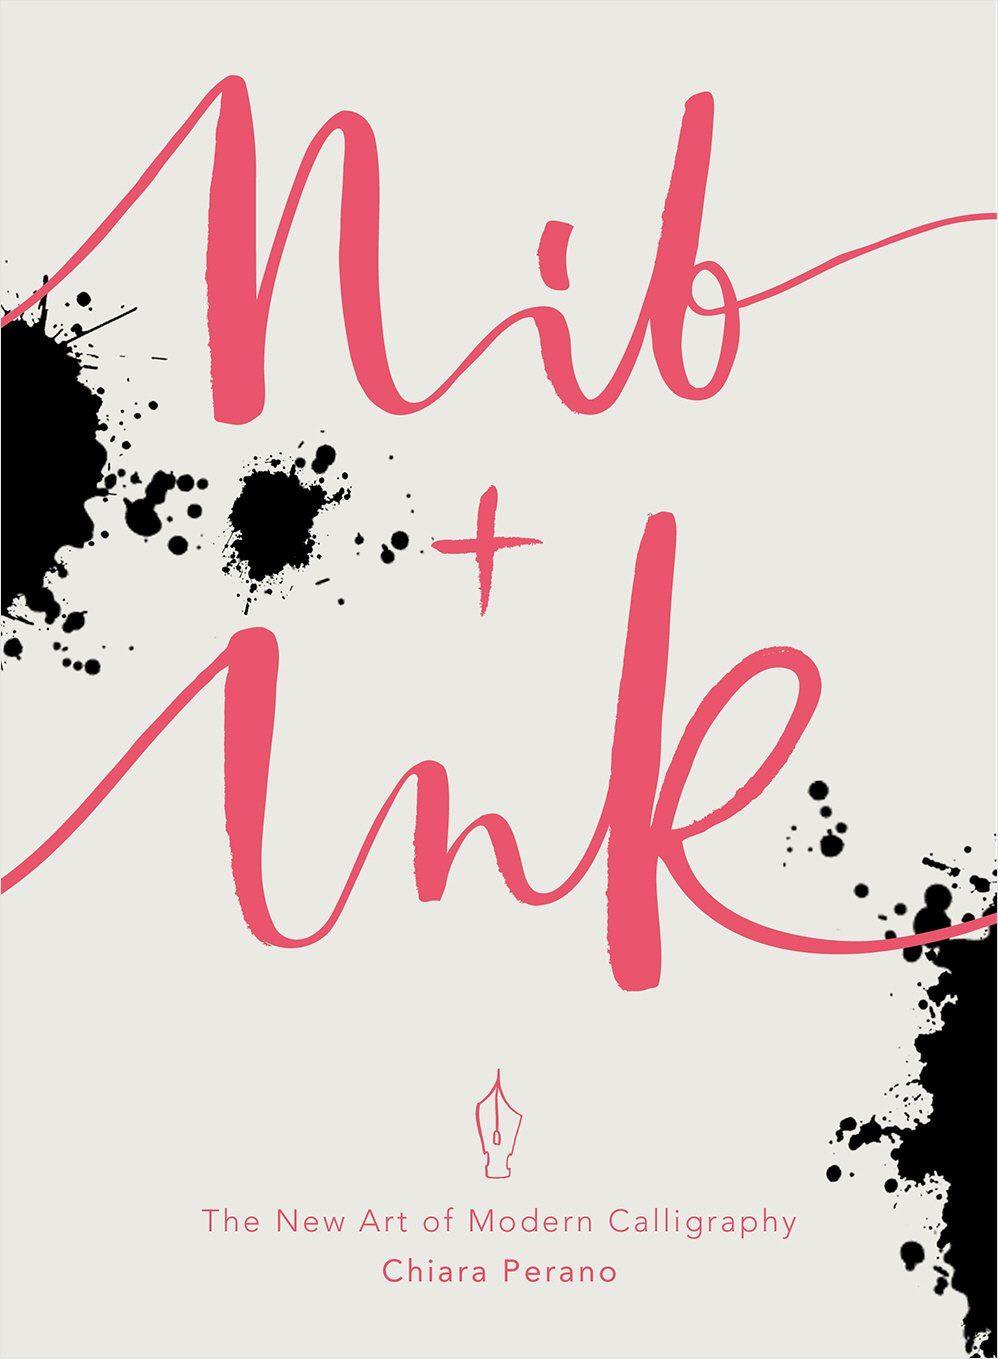 Nib & Ink Calligraphy Book